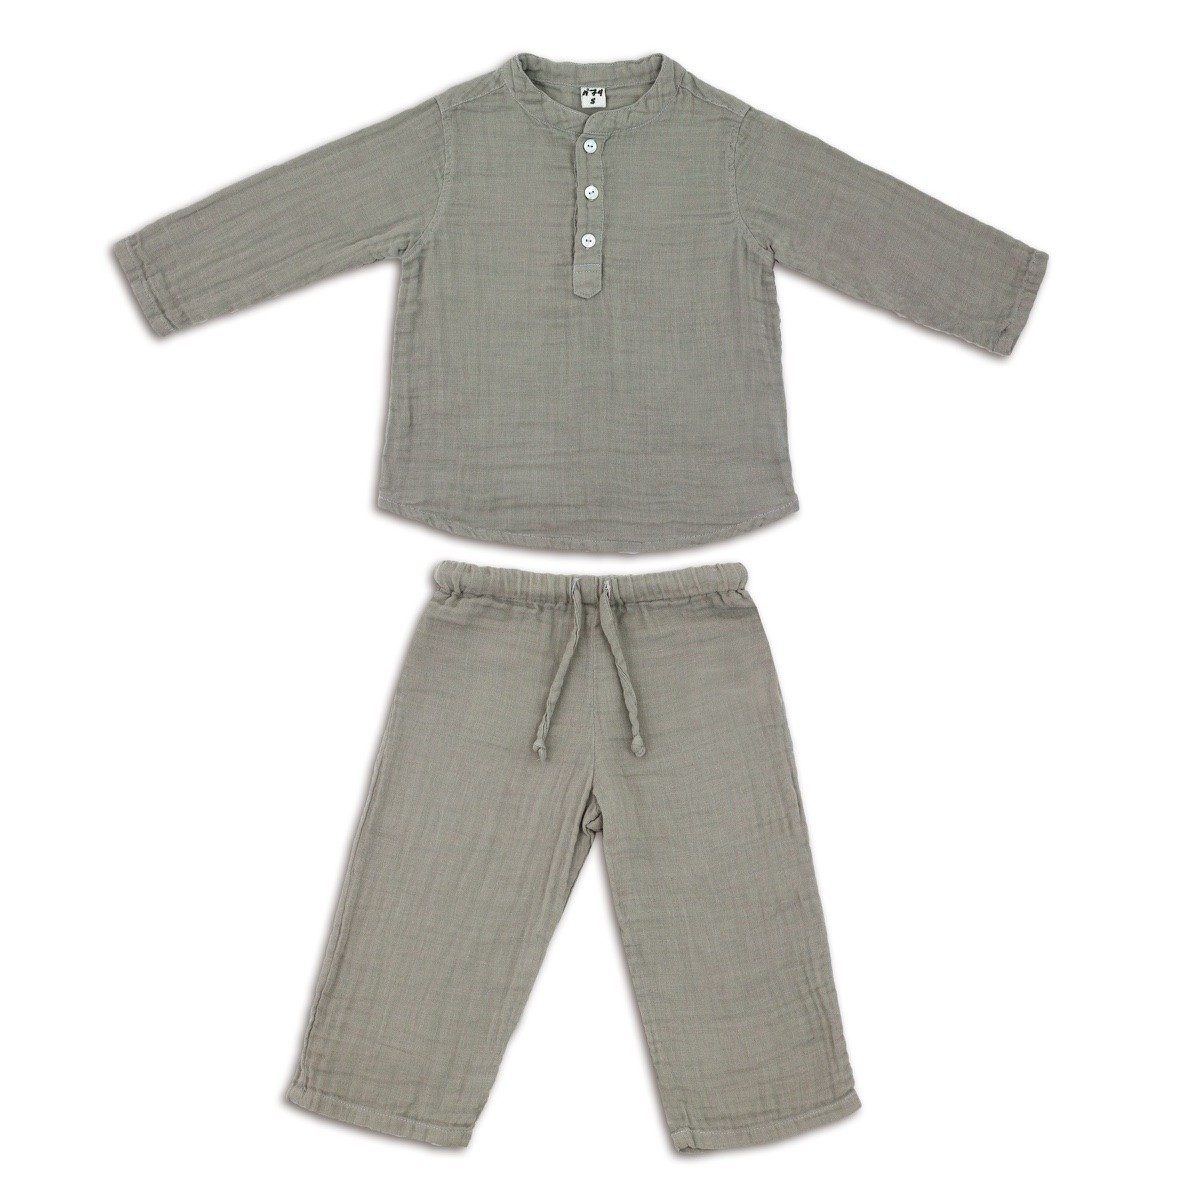 Komplet Dan koszulka & spodnie szary